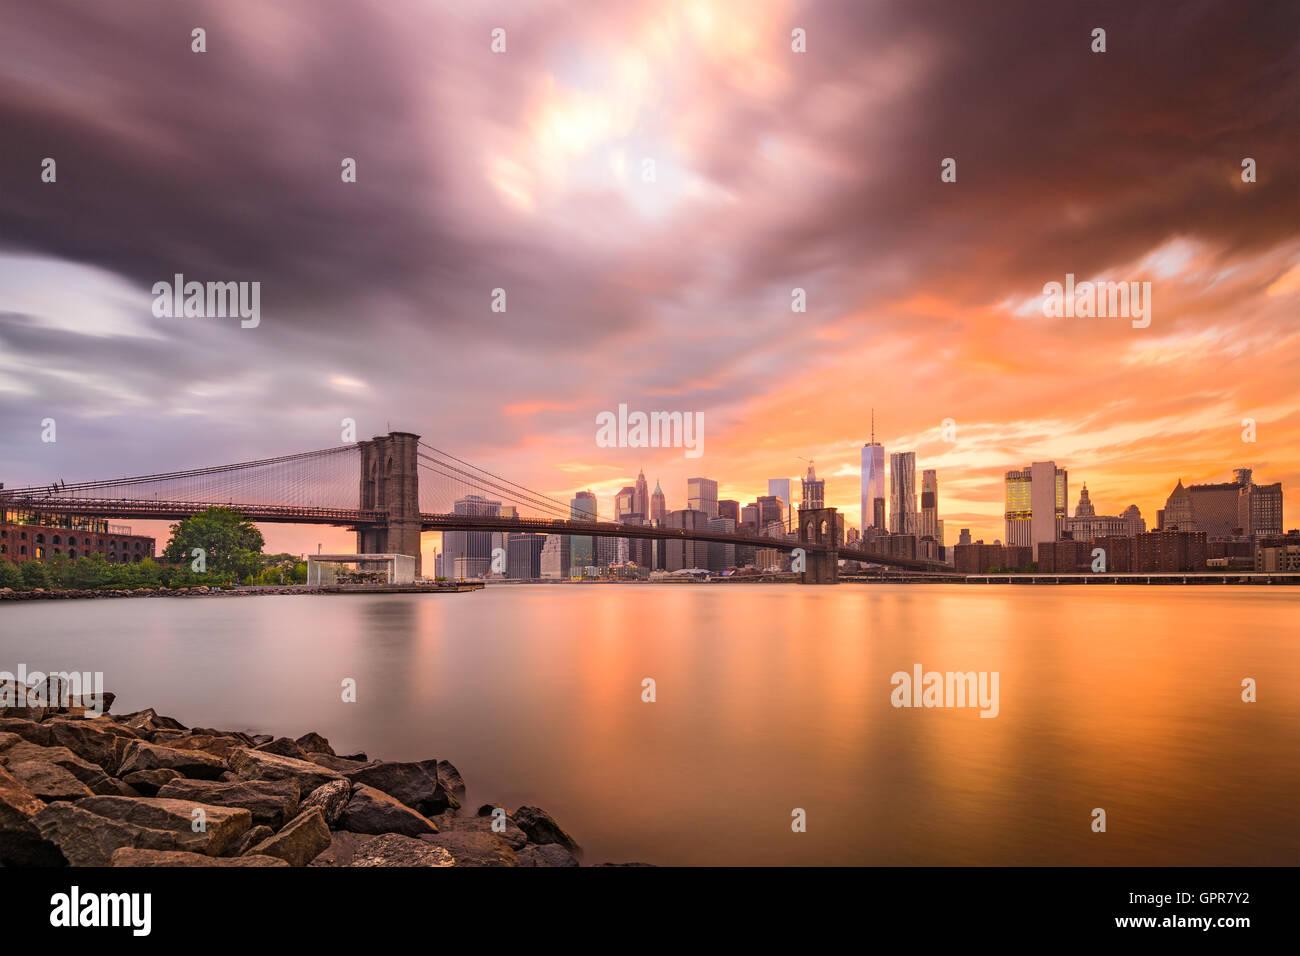 New York City skyline at dusk. - Stock Image